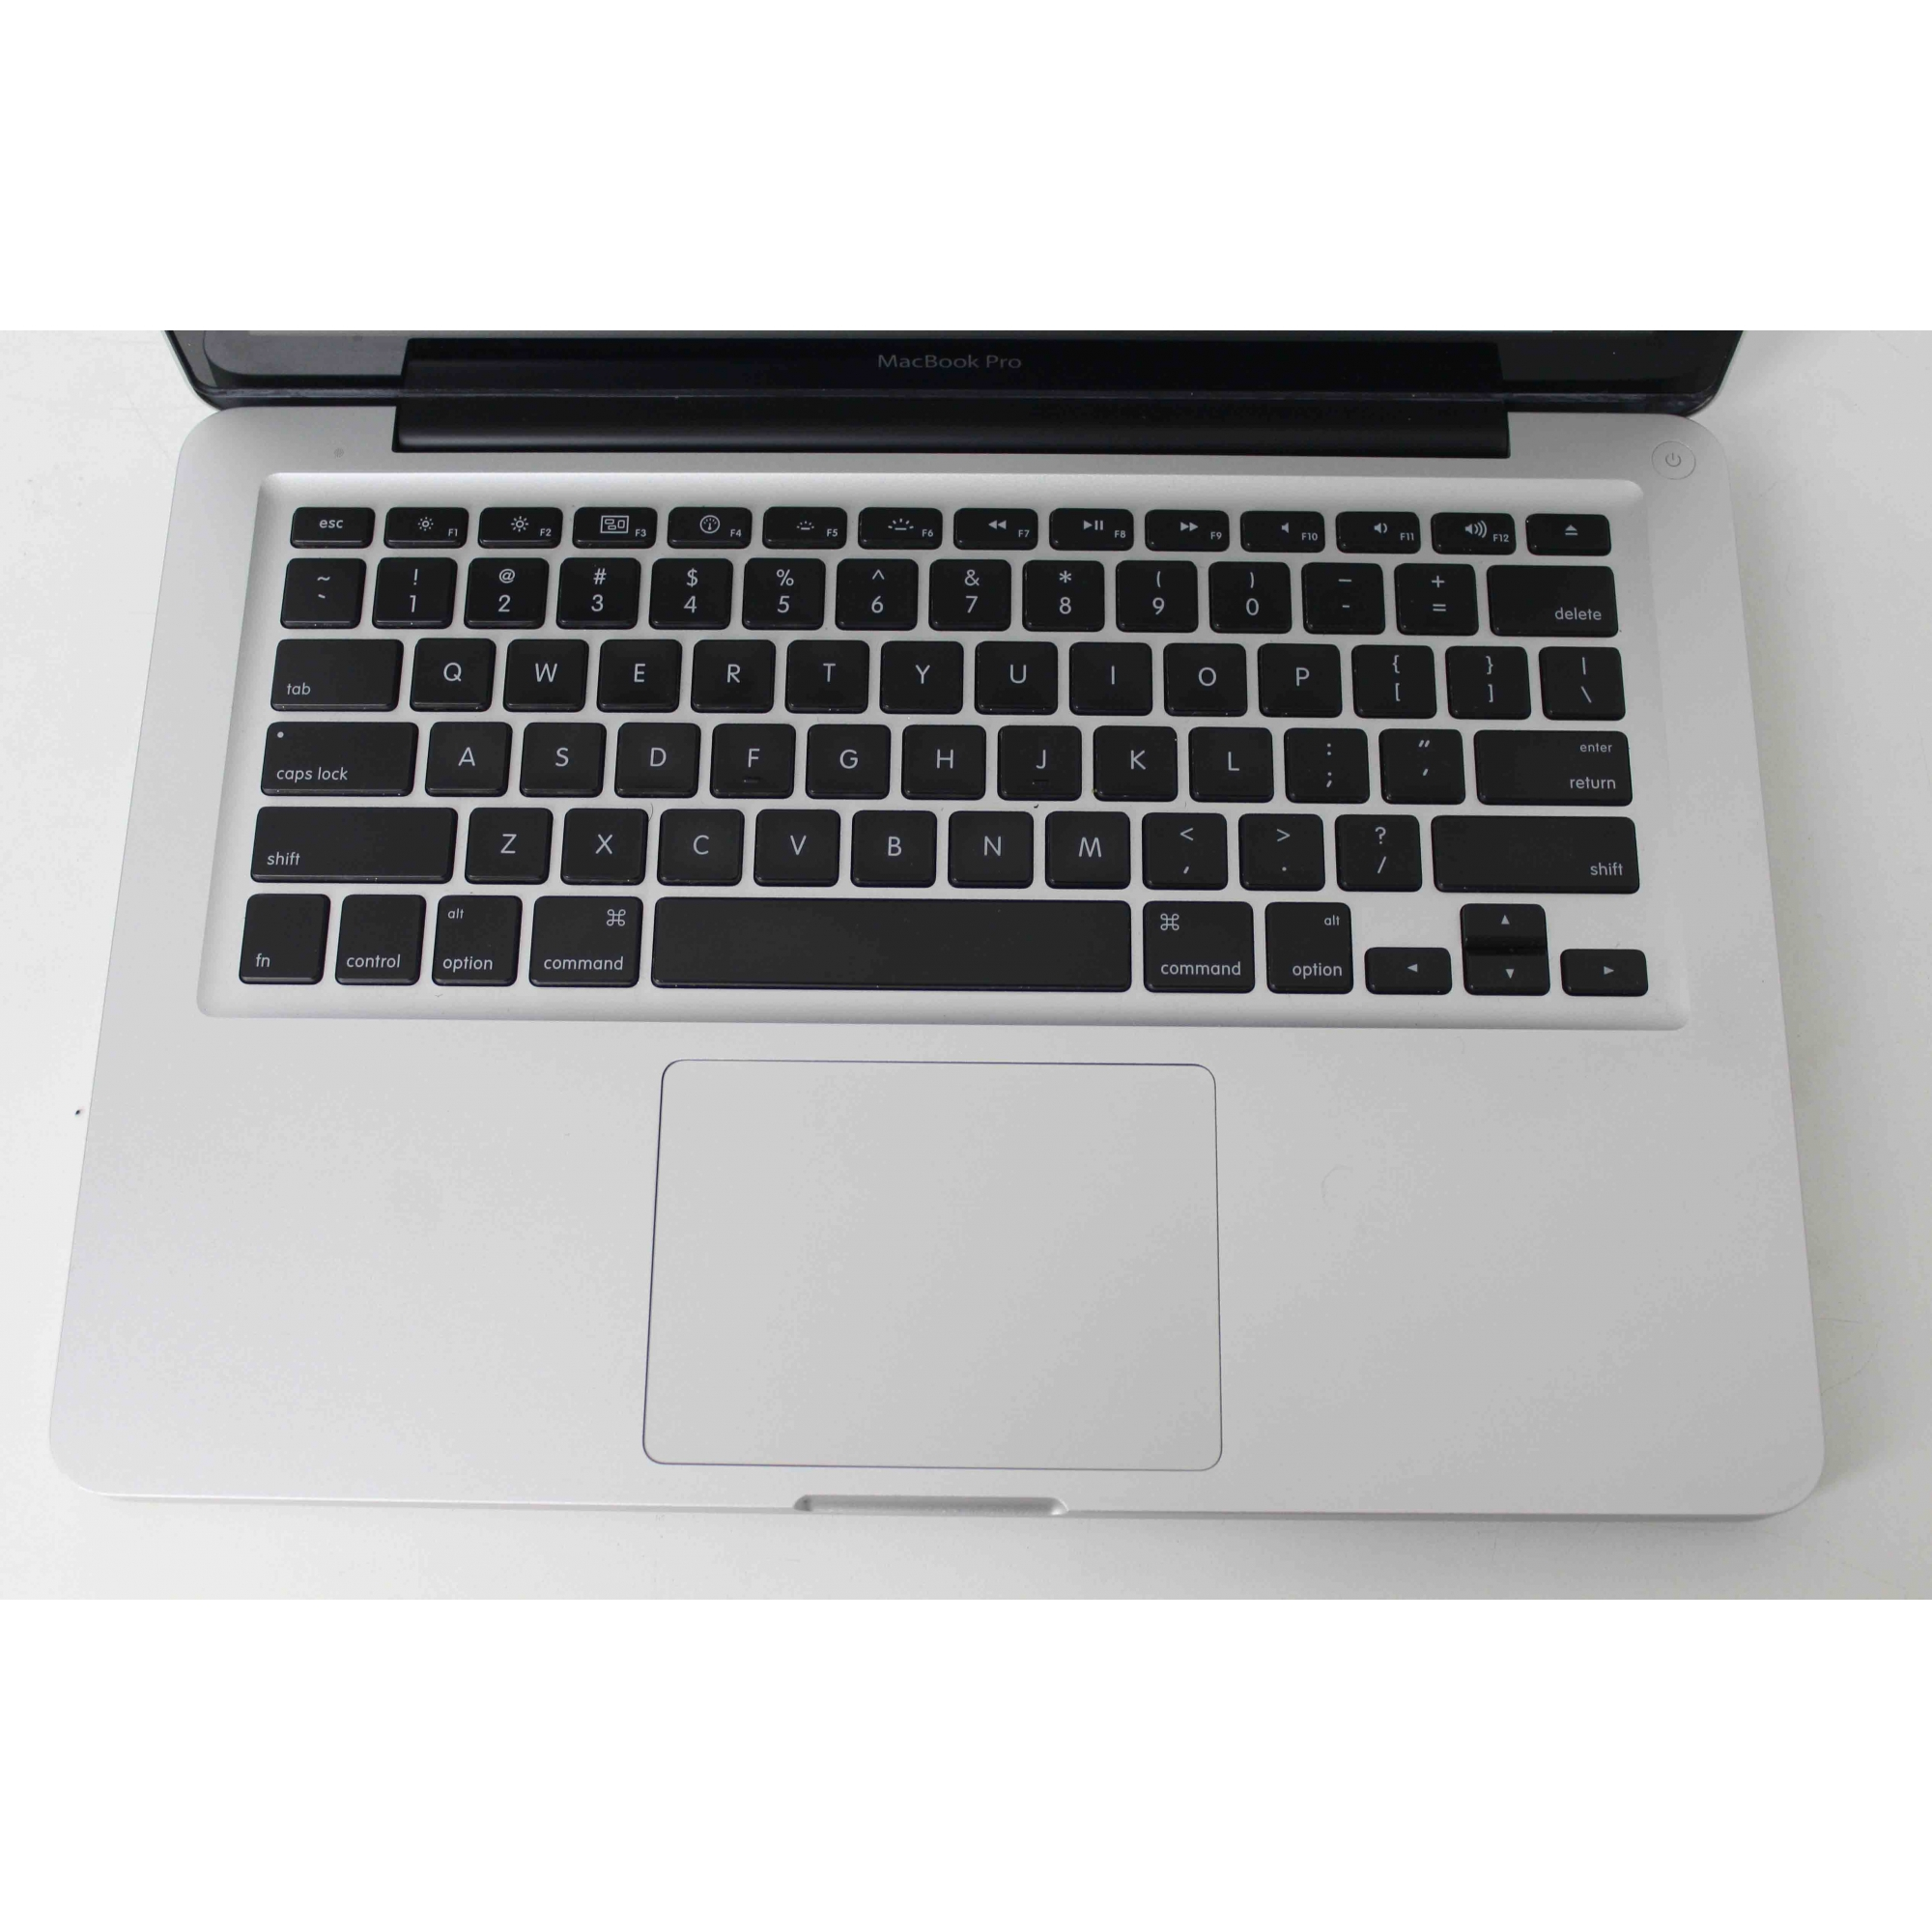 "Macbook Pro MB991LL/A 13.3"" Intel Core 2 Duo 2.53GHz 4GB HD-320GB"